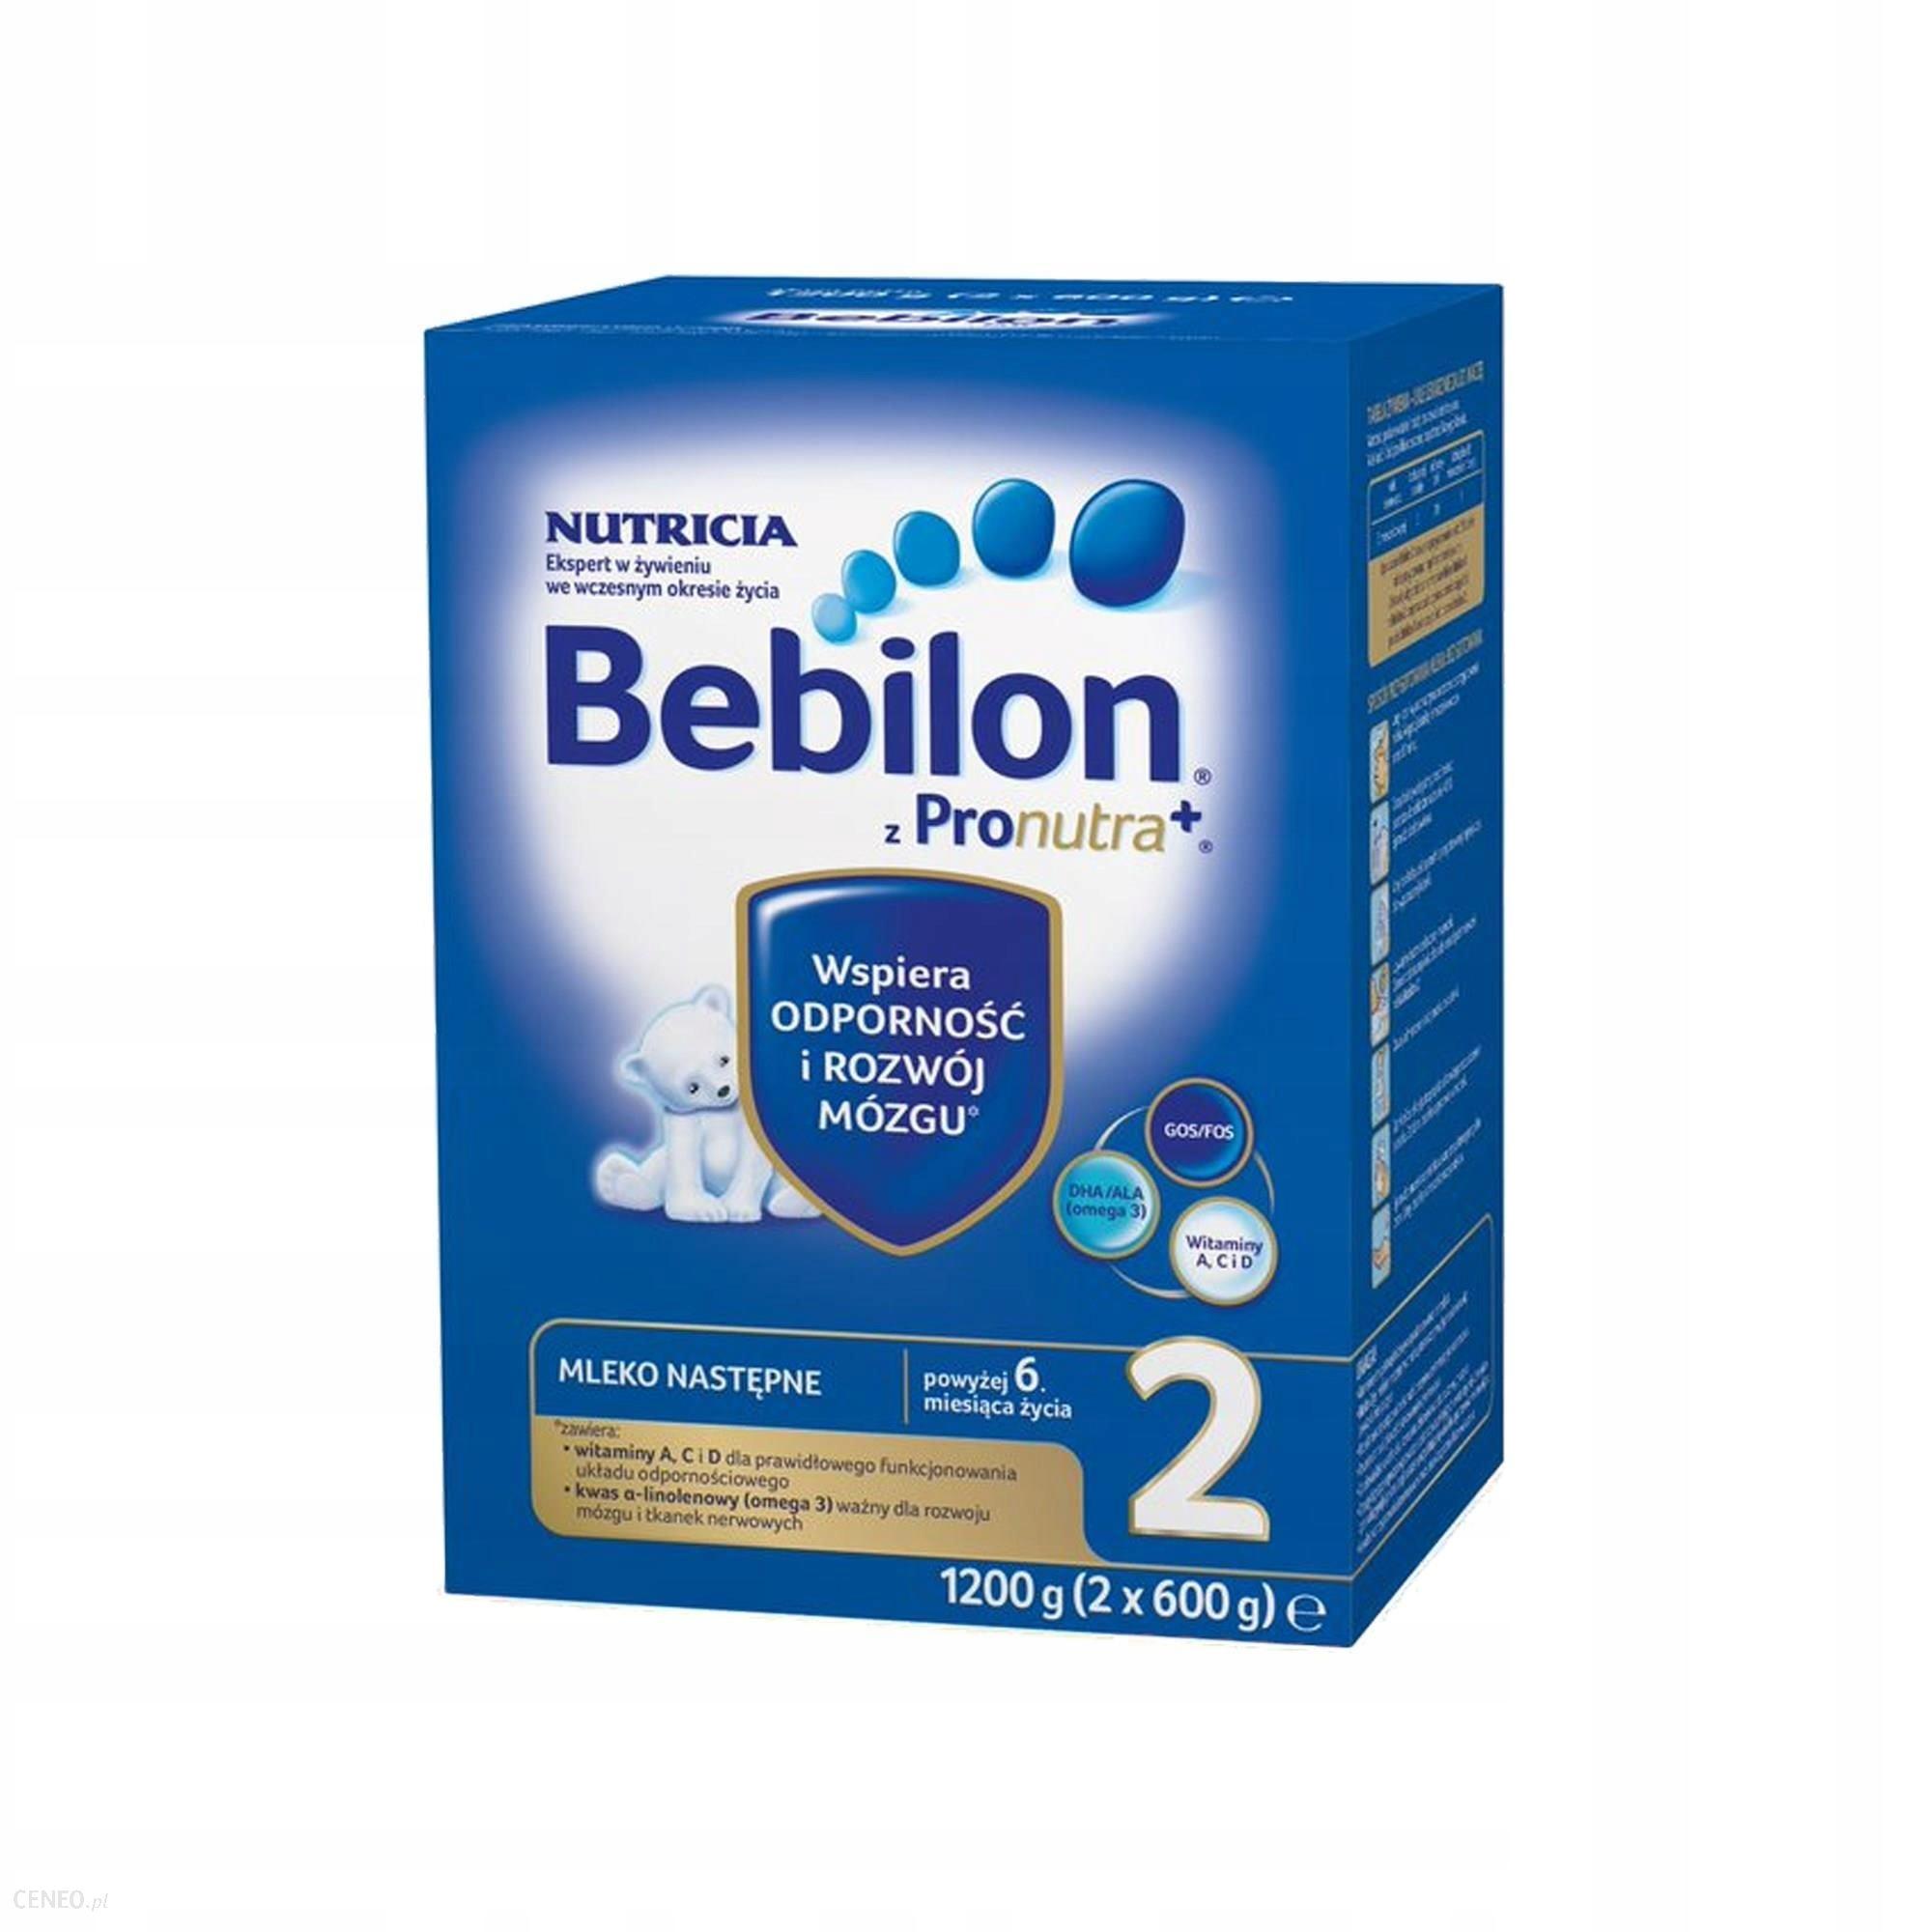 Bebilon 2 z Pronutra+ proszek 1200 g